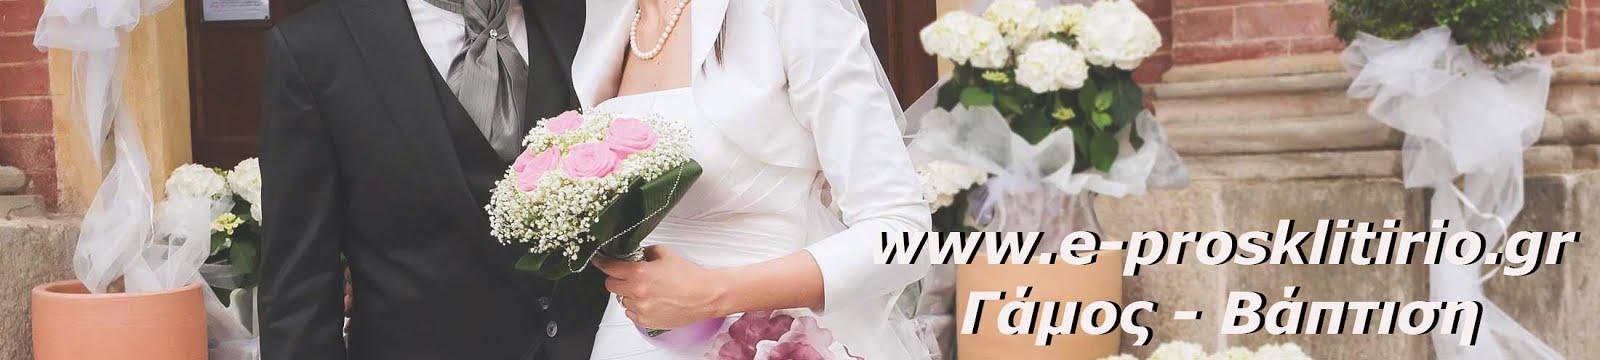 e-prosklitirio.gr - Είδη Γάμου - Βάπτισης